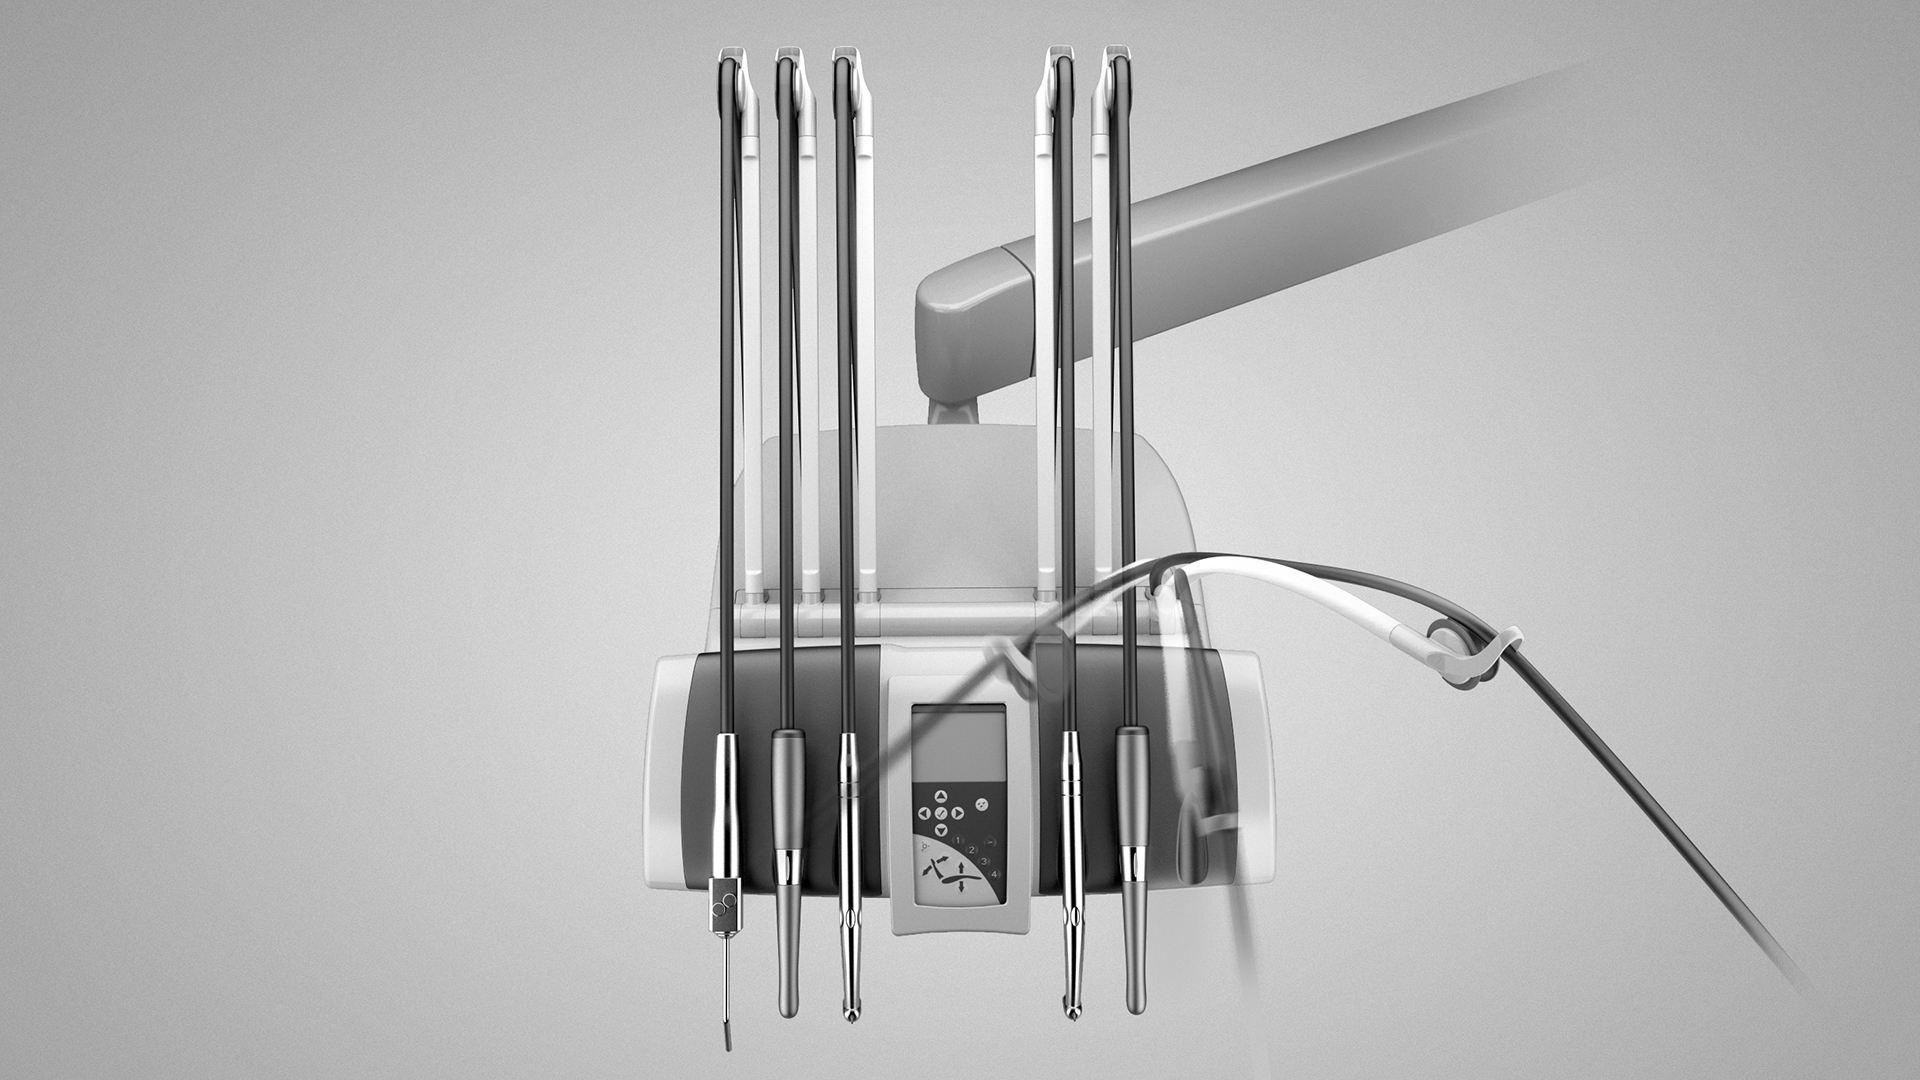 priority_designs_midmark_dental_equipment_design_engineering_prototyping_010